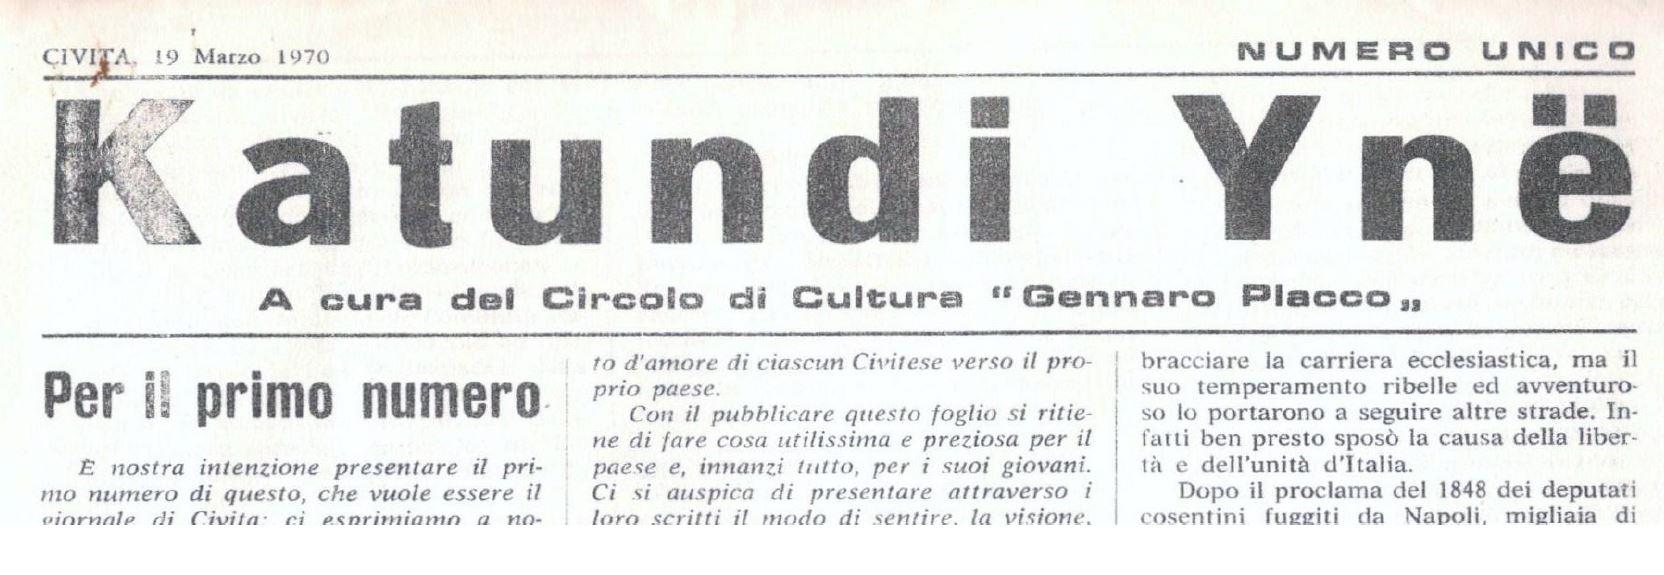 KATUNDI YNË (4 gennaio 1970 - 4 gennaio 2020)